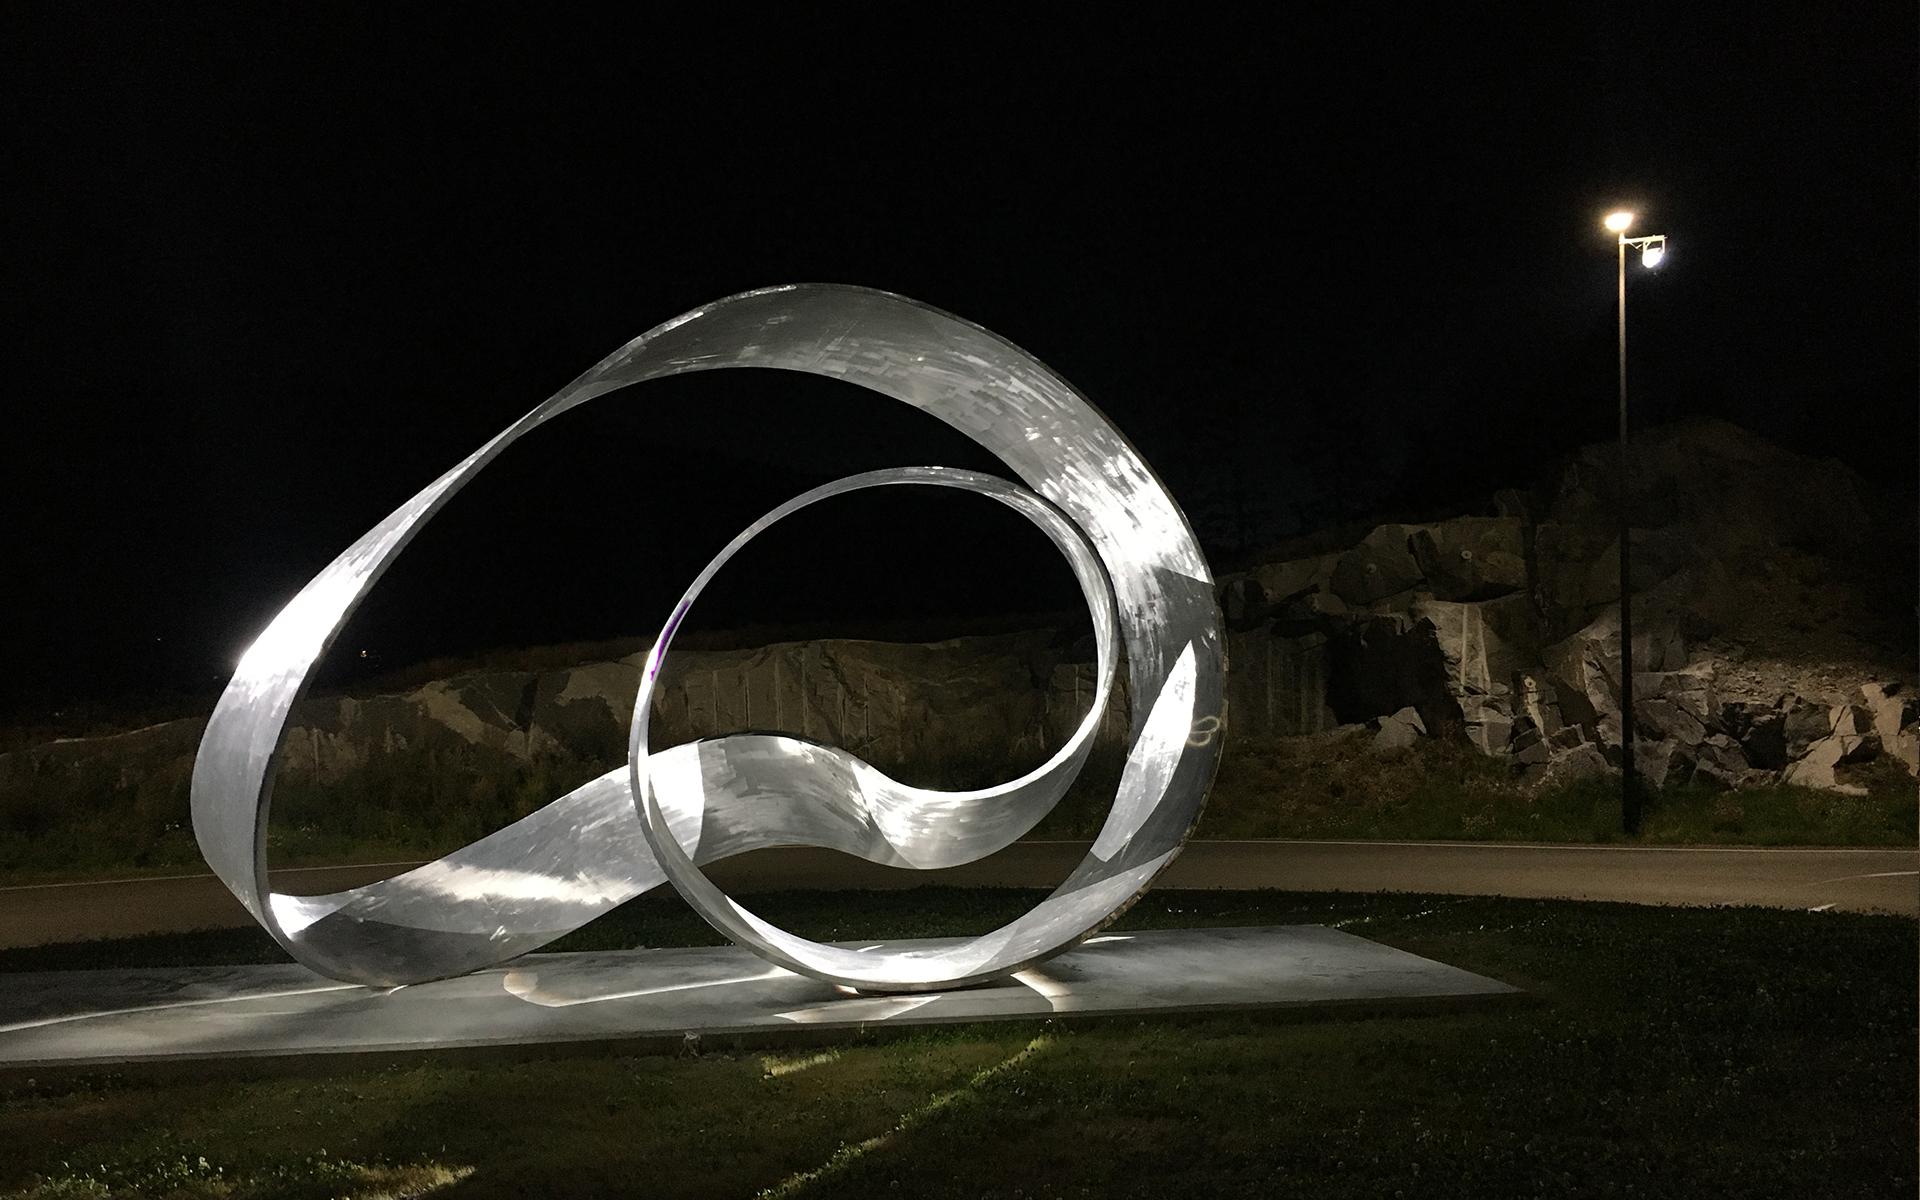 Moebius Variations - Upright Moebius. Light design by Halvor Næss Belysningsdesigner AS